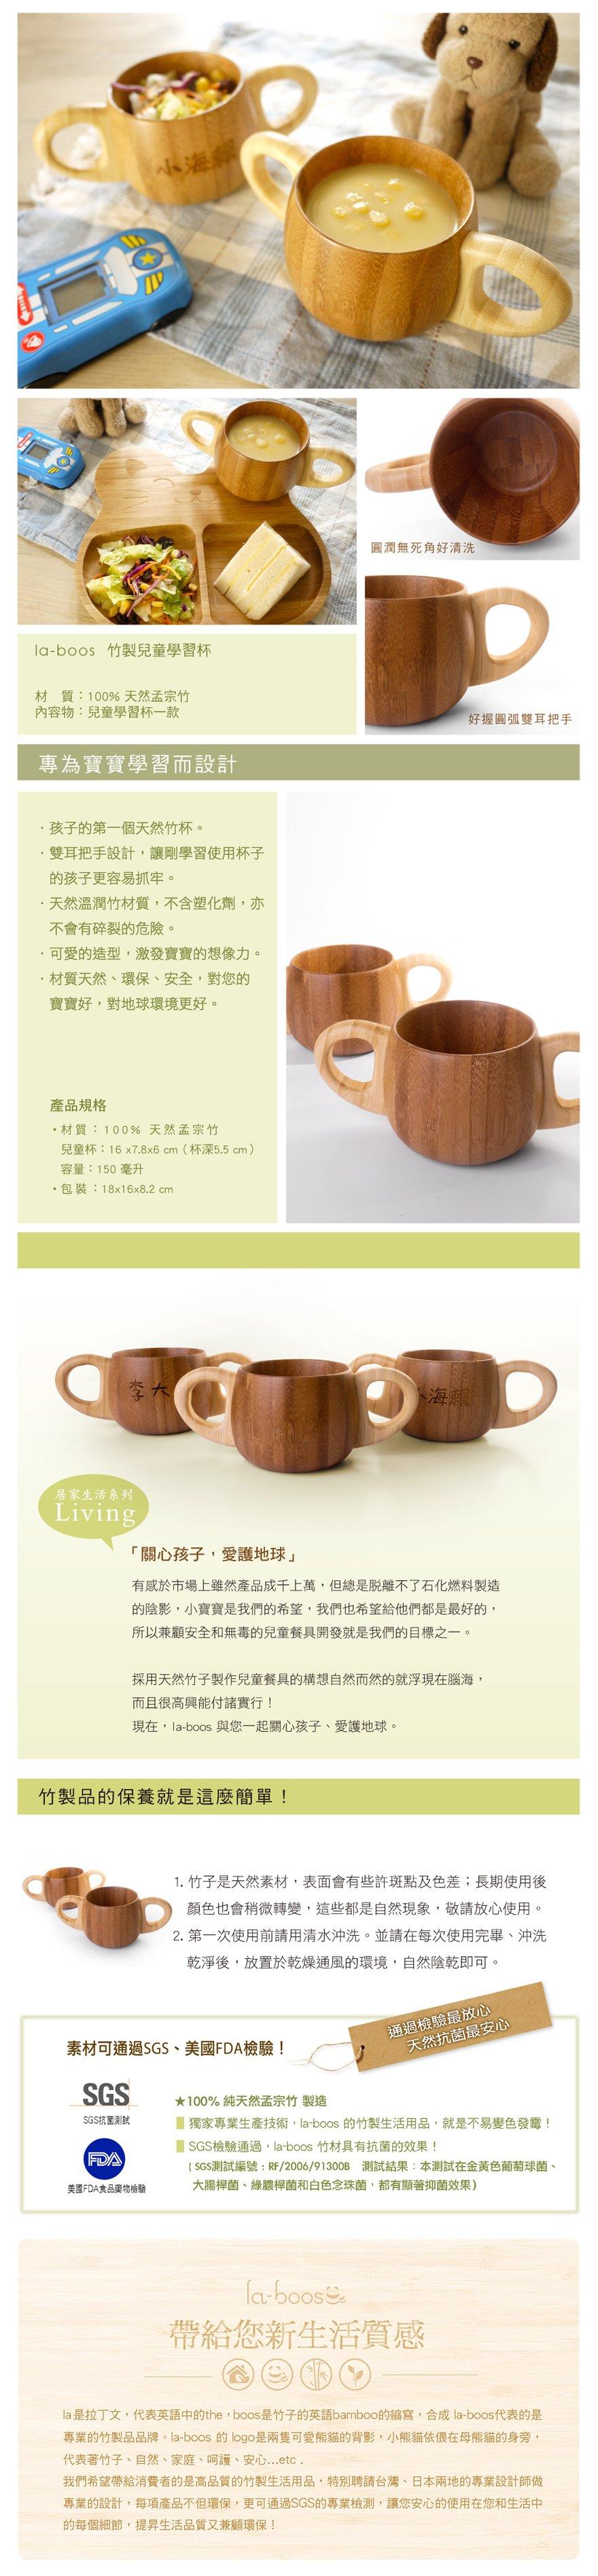 la-boos竹製雙耳兒童學習杯